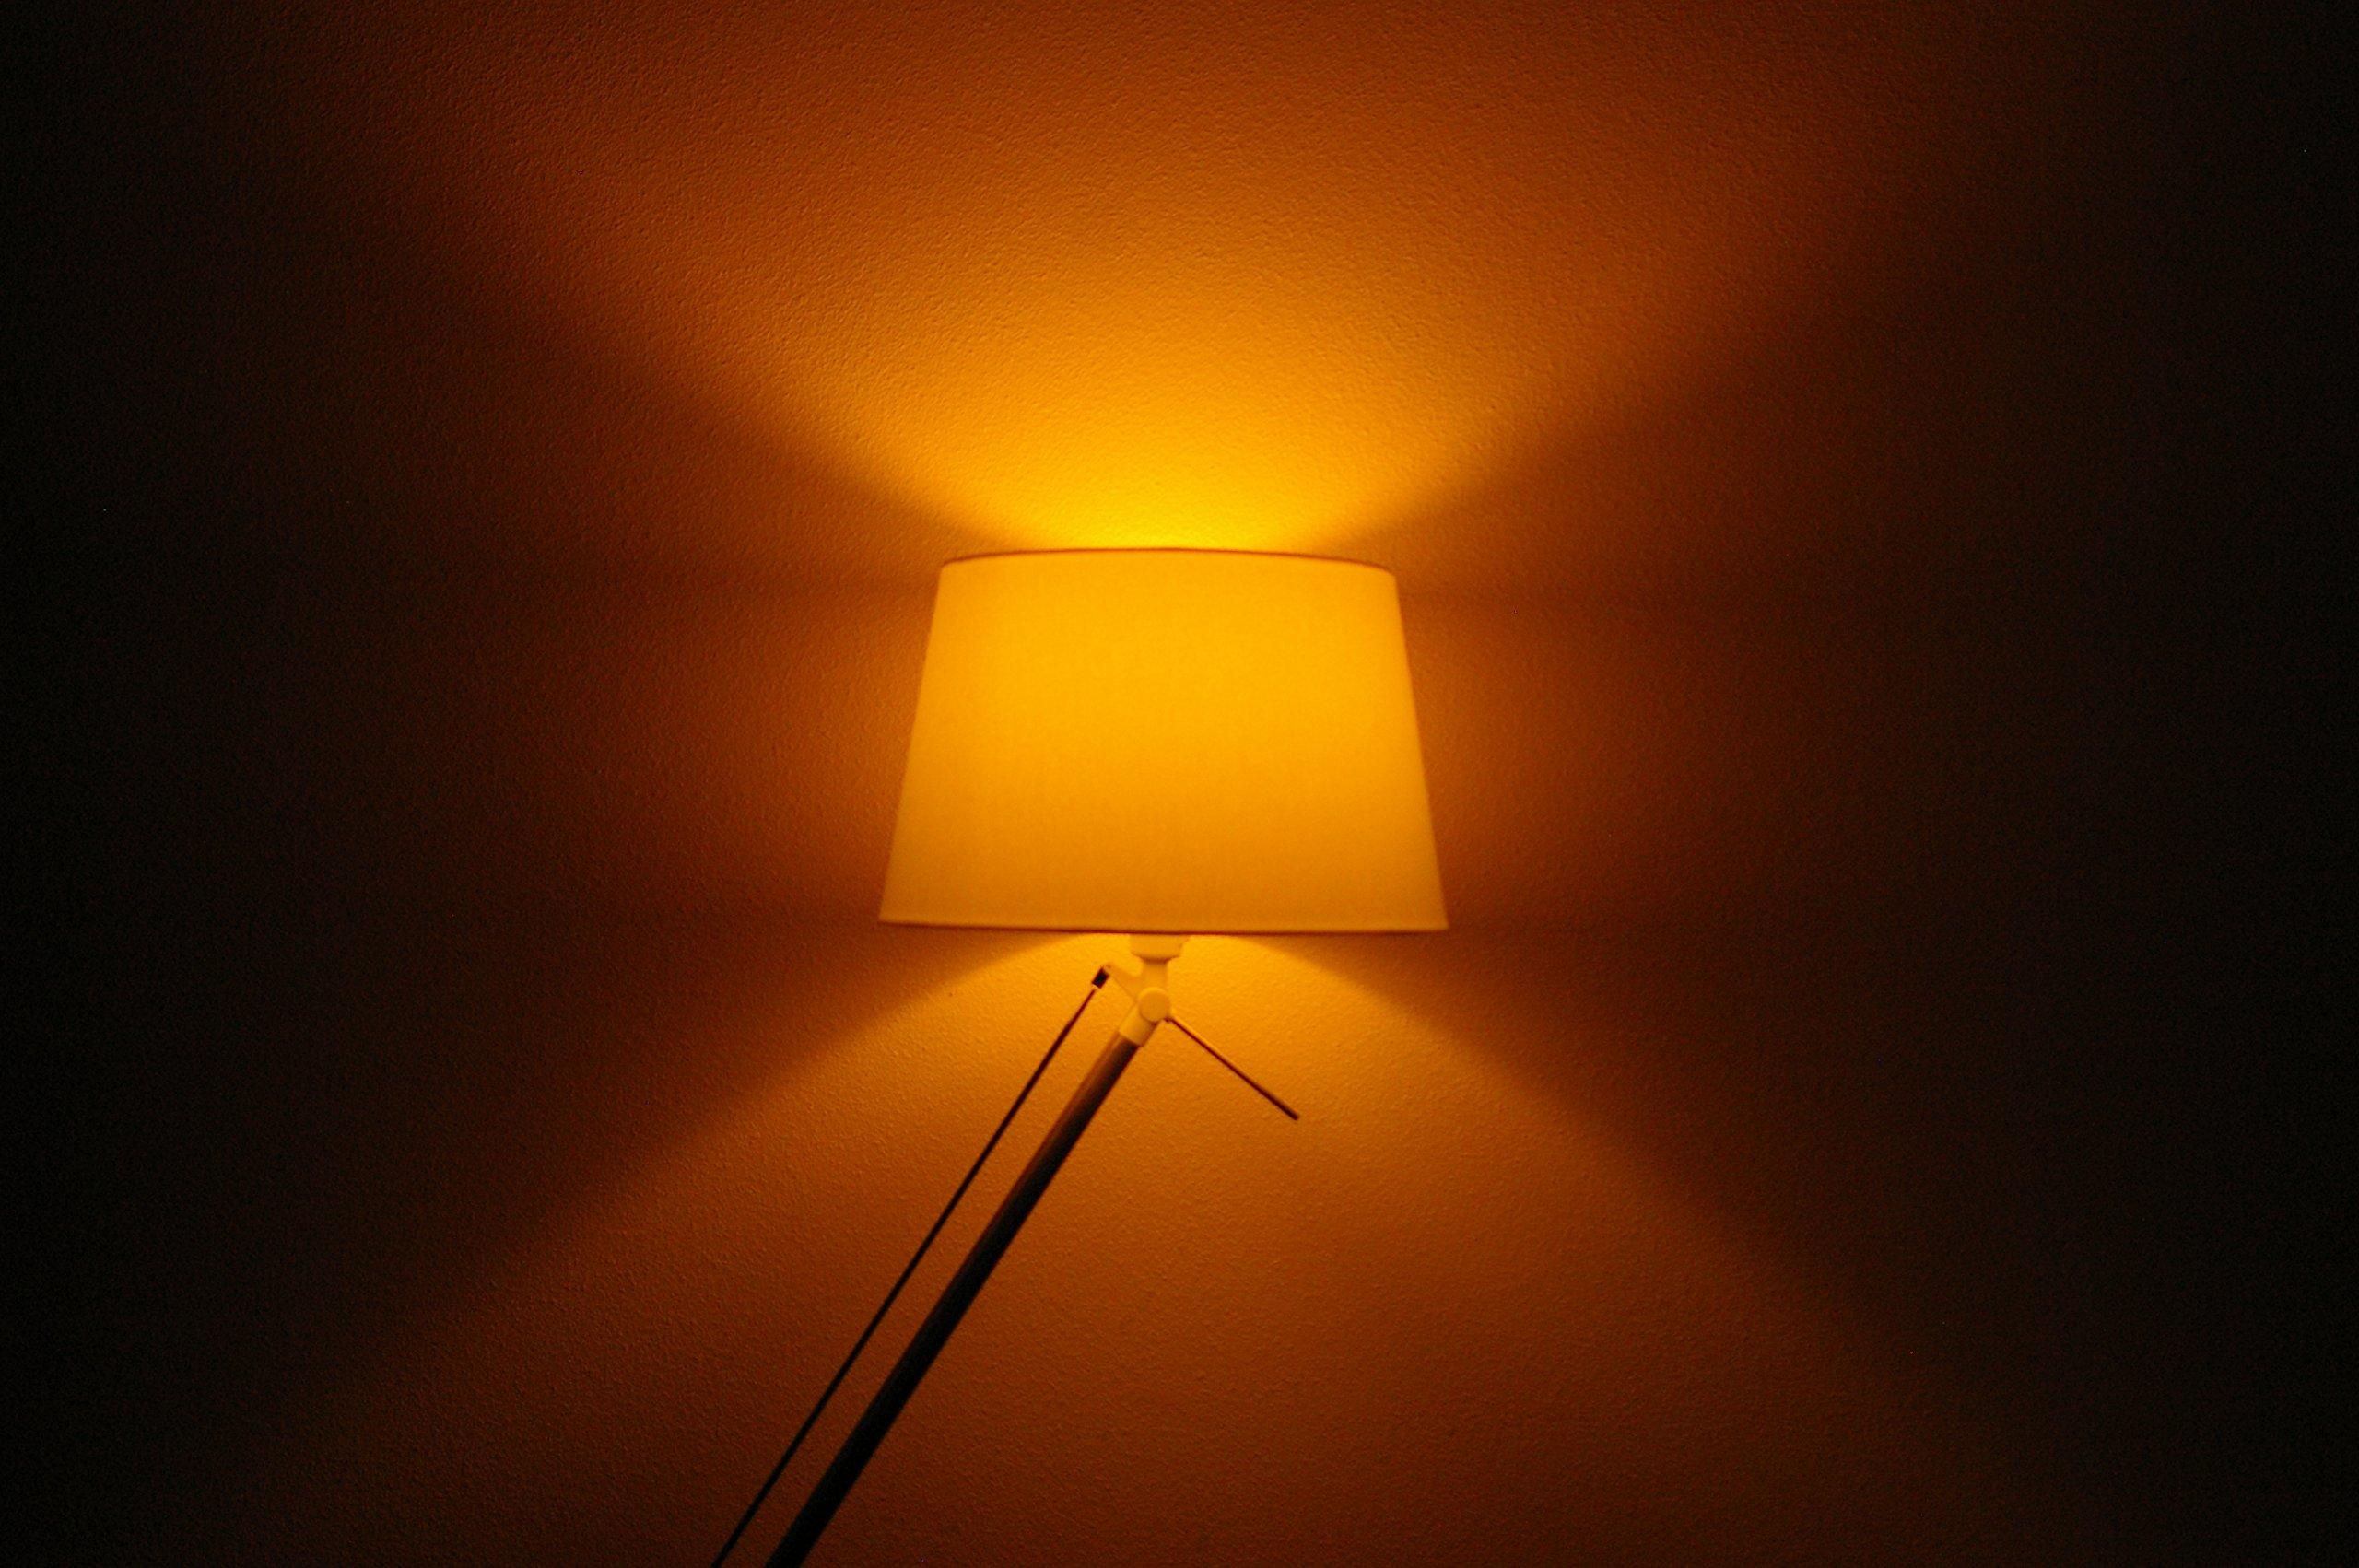 Innr E27 Smart LED Lampe, Color, dimmbar, RGBW, kompatibel mit Echo Plus und Philips Hue* RB 185 C